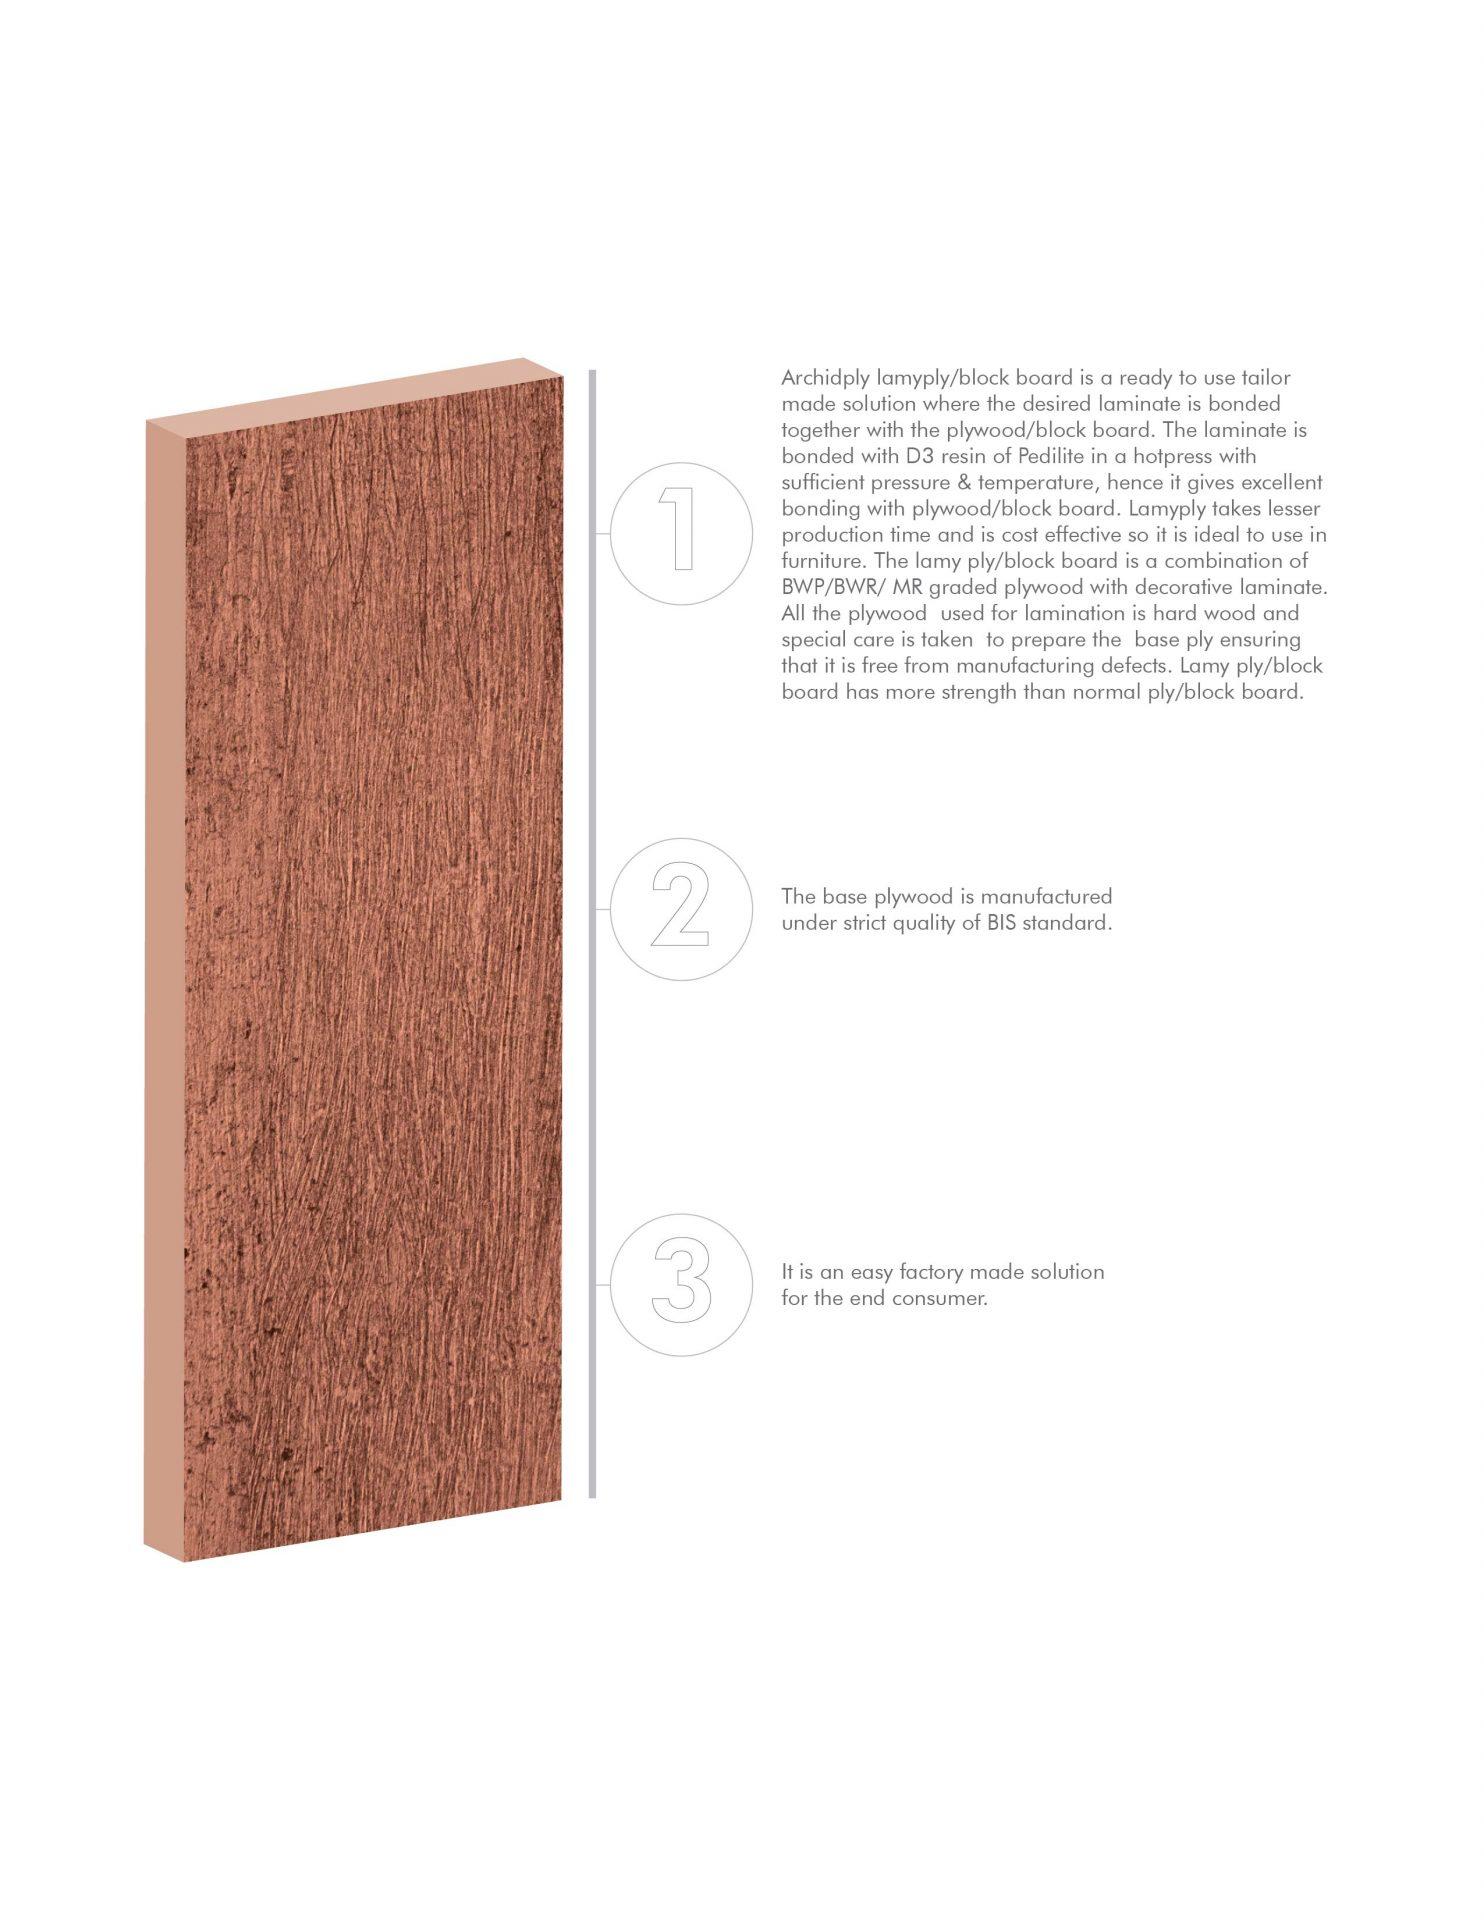 archidply-laminated-plywood-amp-block-board